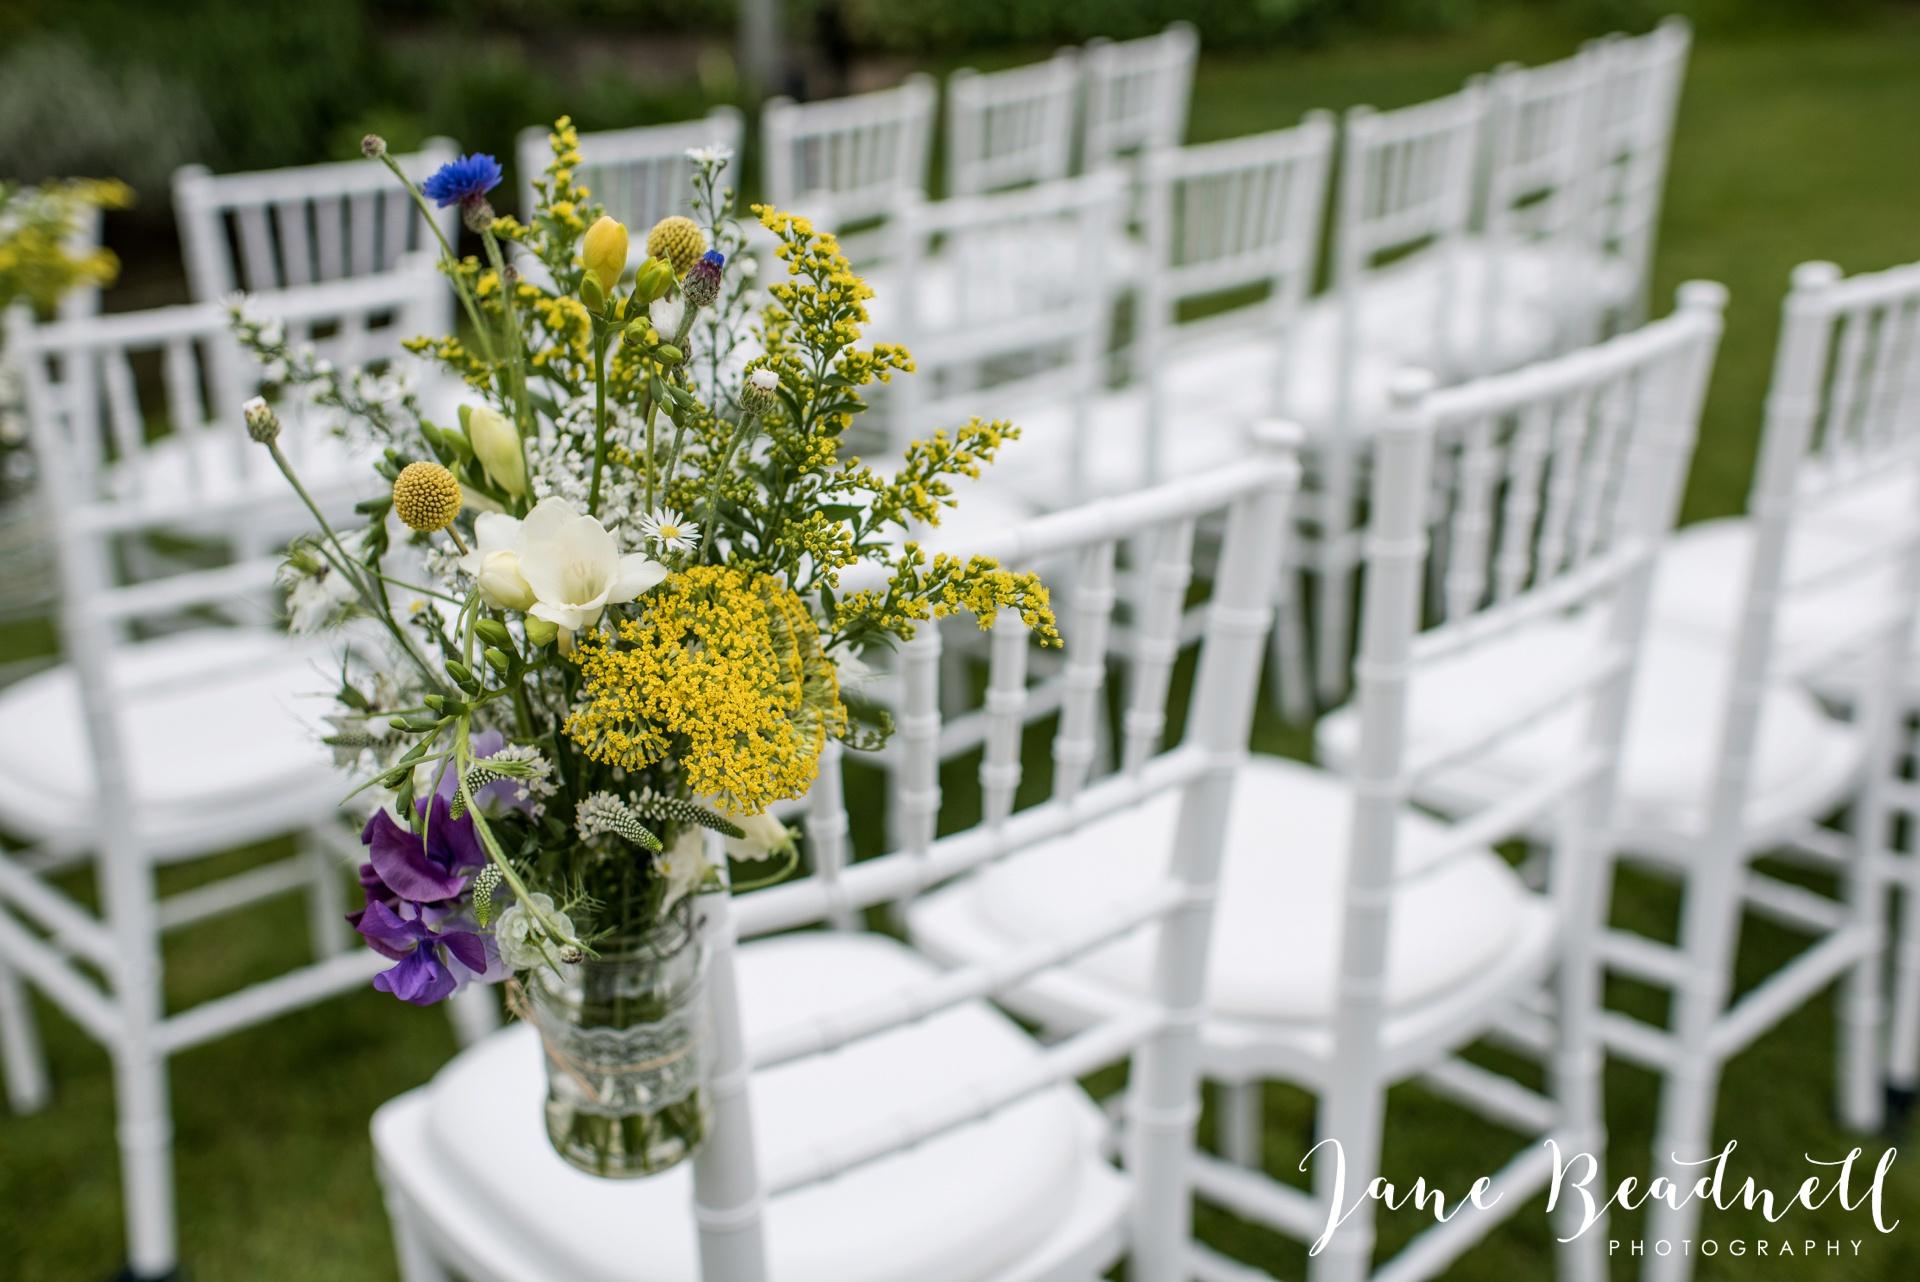 South Farm Wedding photography Hertfordshire by Jane Beadnell Photography fine art wedding photographer_0025